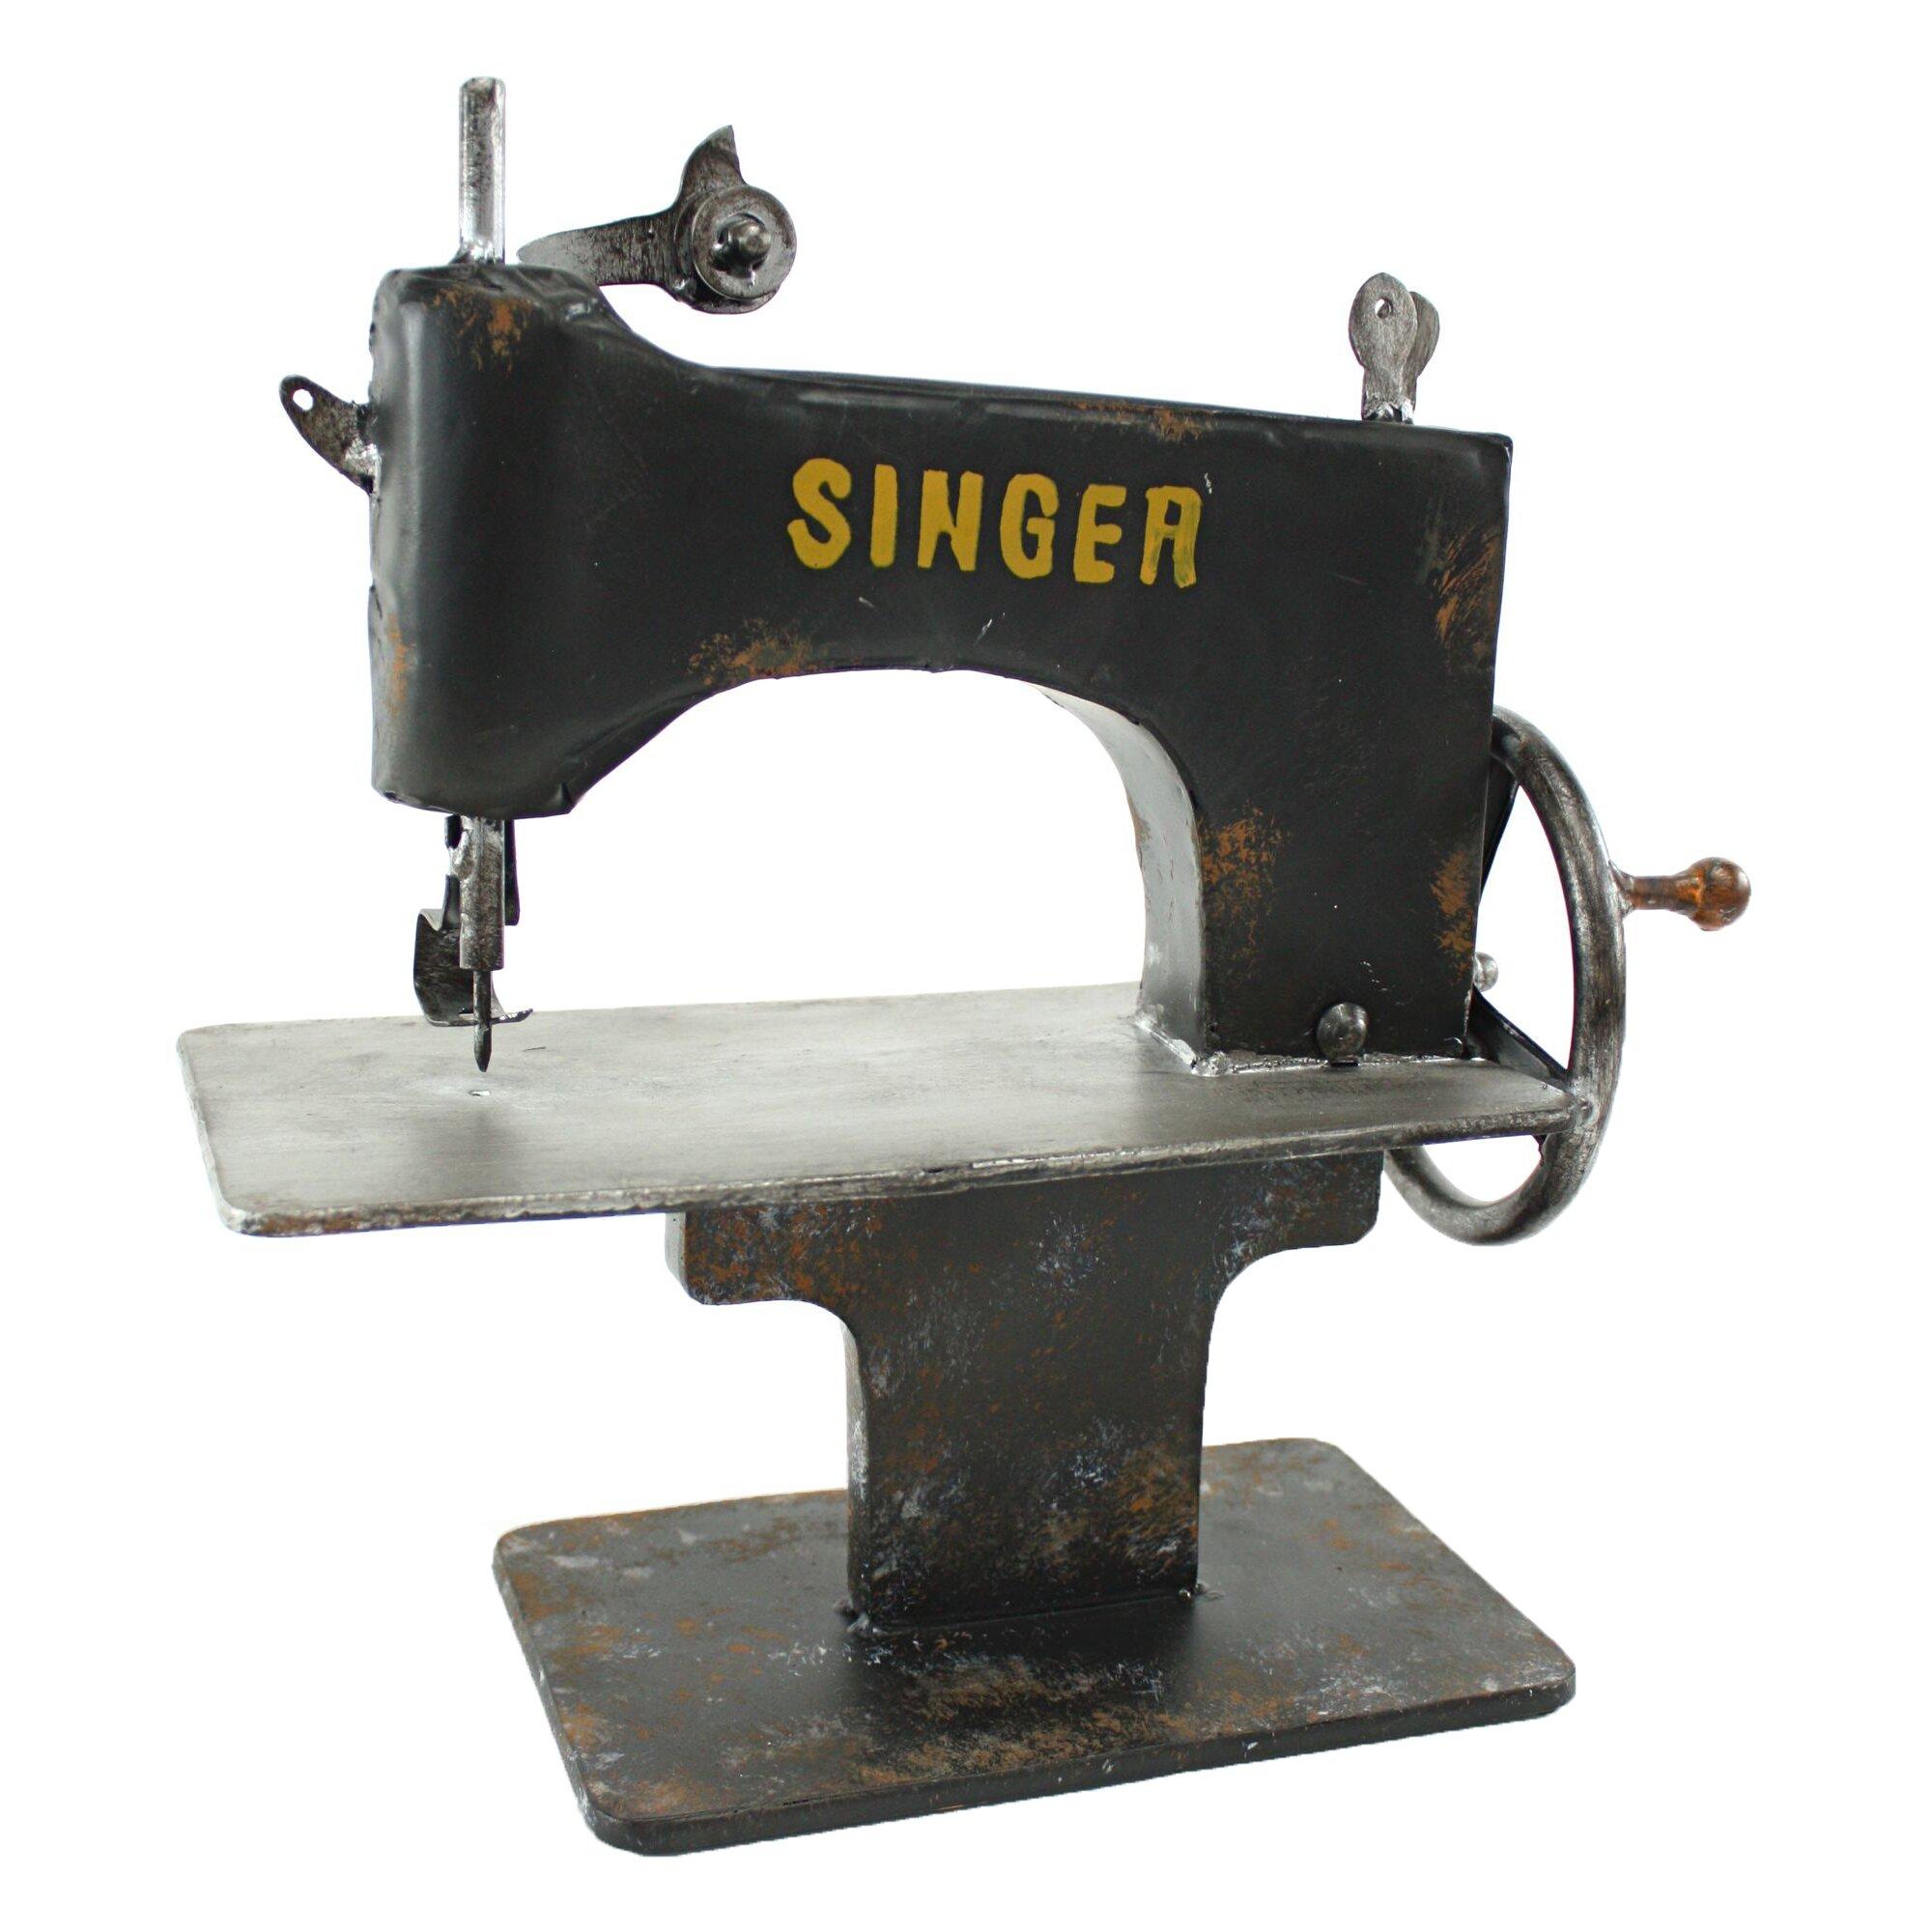 Singer metal sewing machine decor wayfair for Decor 99 sewing machine